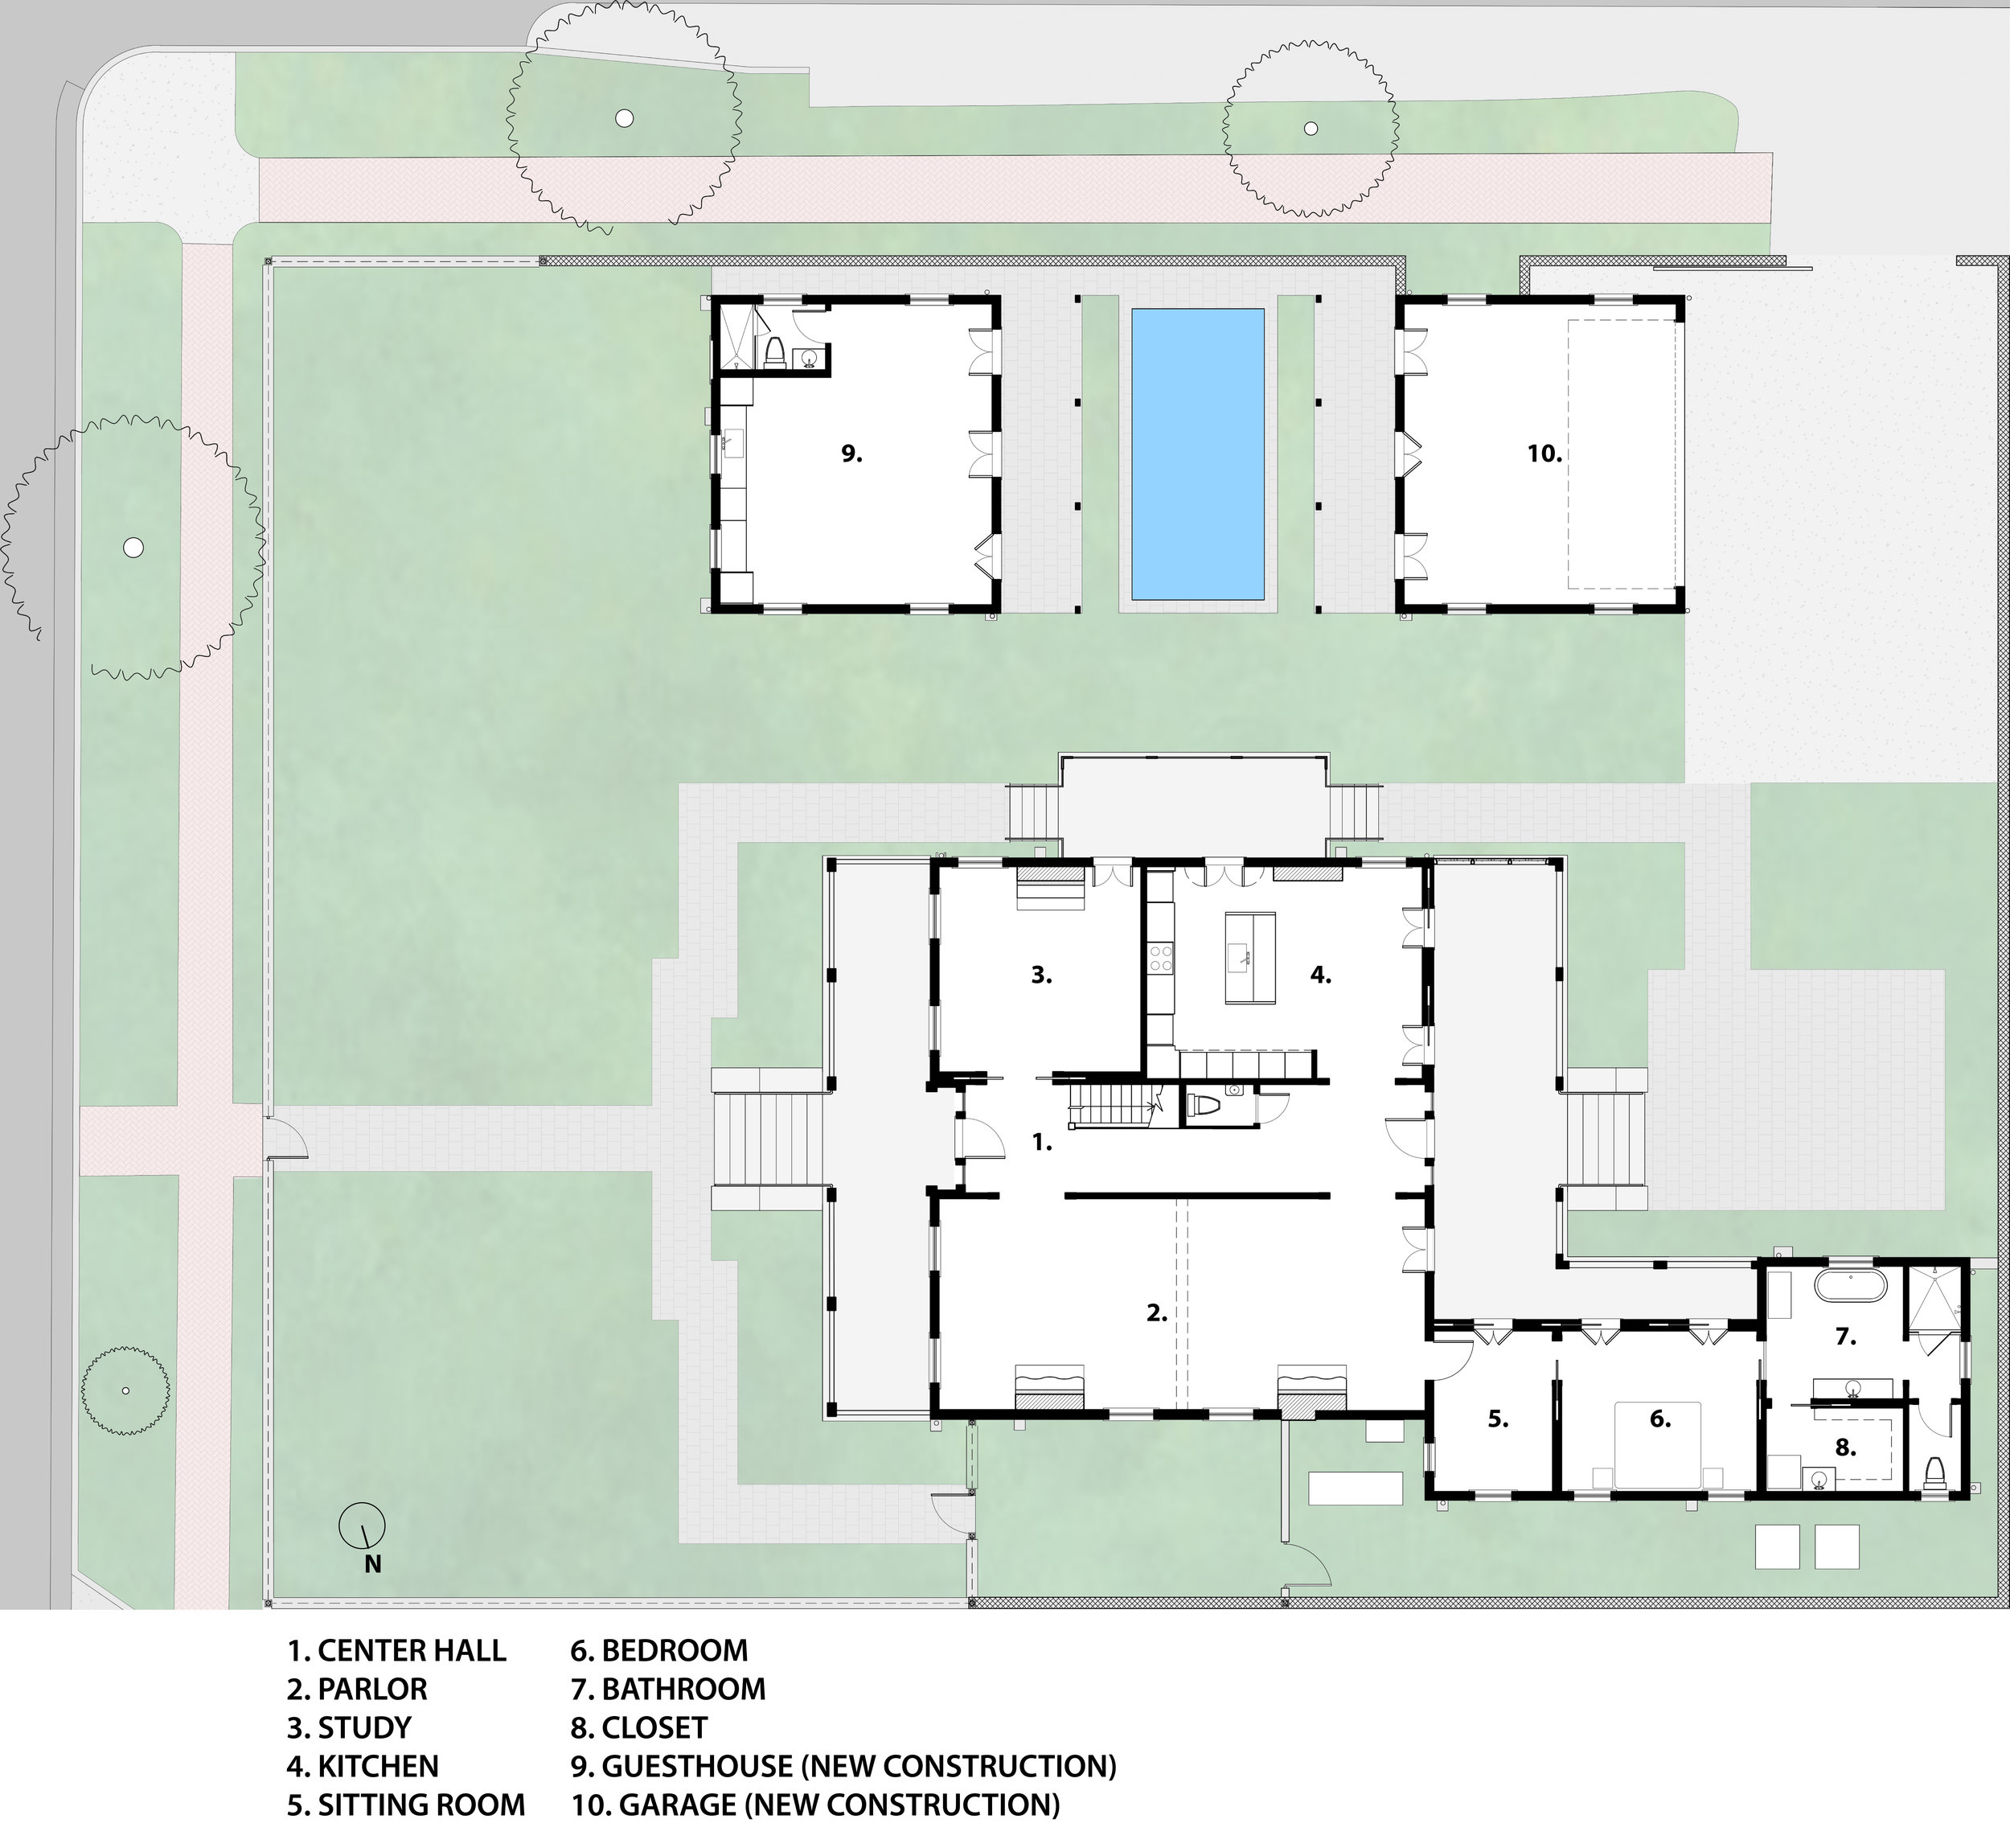 siteplan2-3-01.jpg